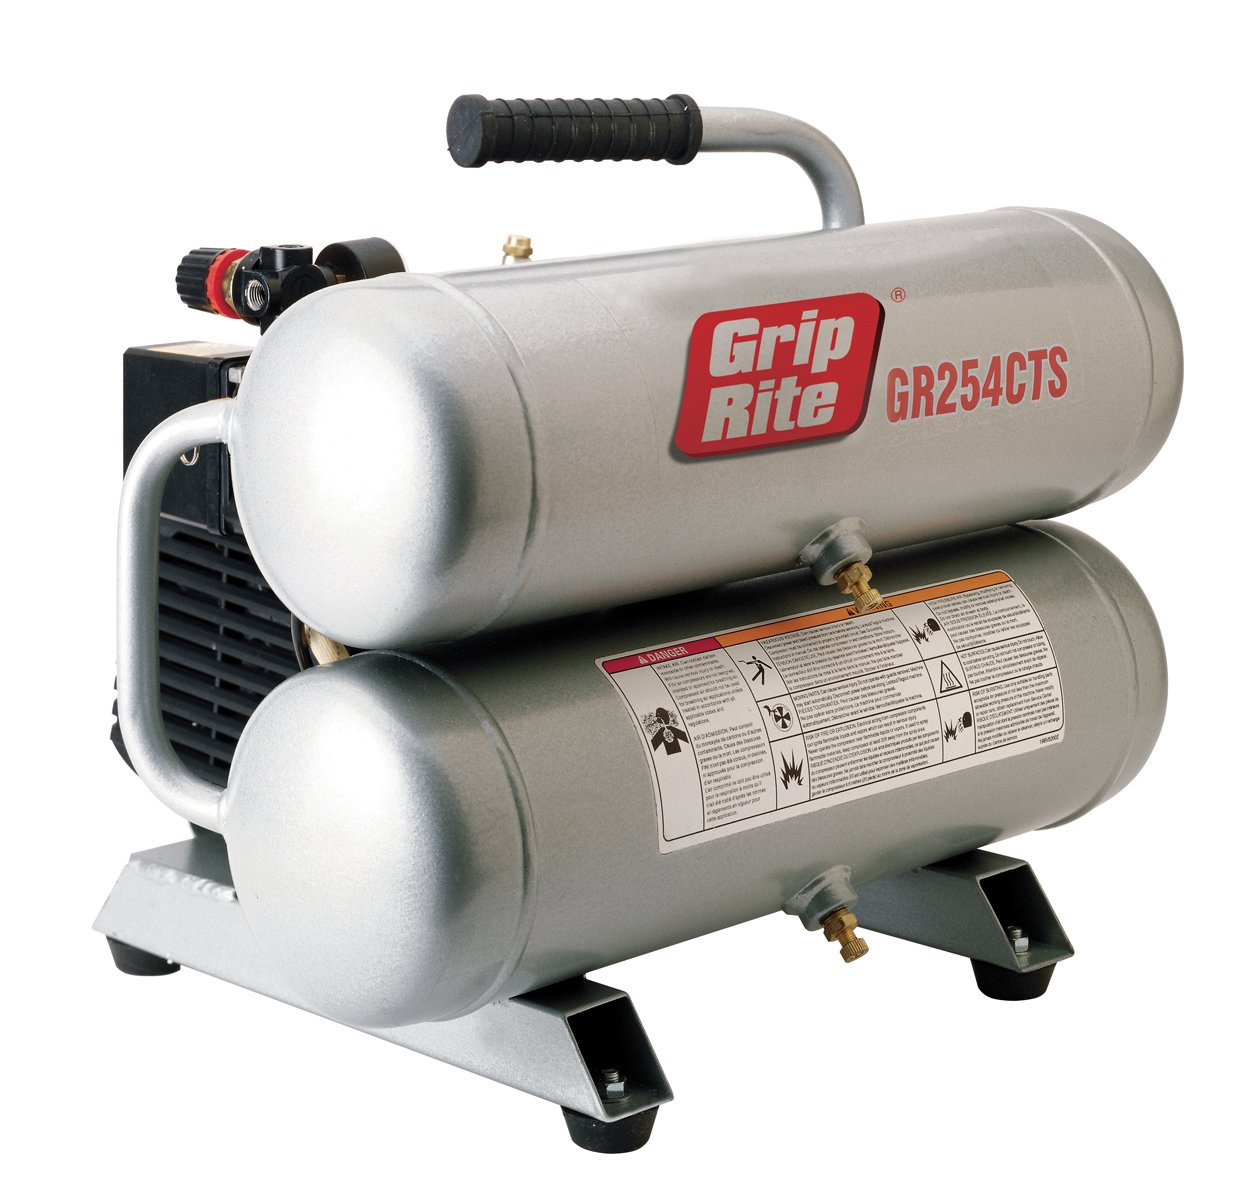 Grip-Rite GR254CTS 2HP 4 Gallon Twin Stack Compressor